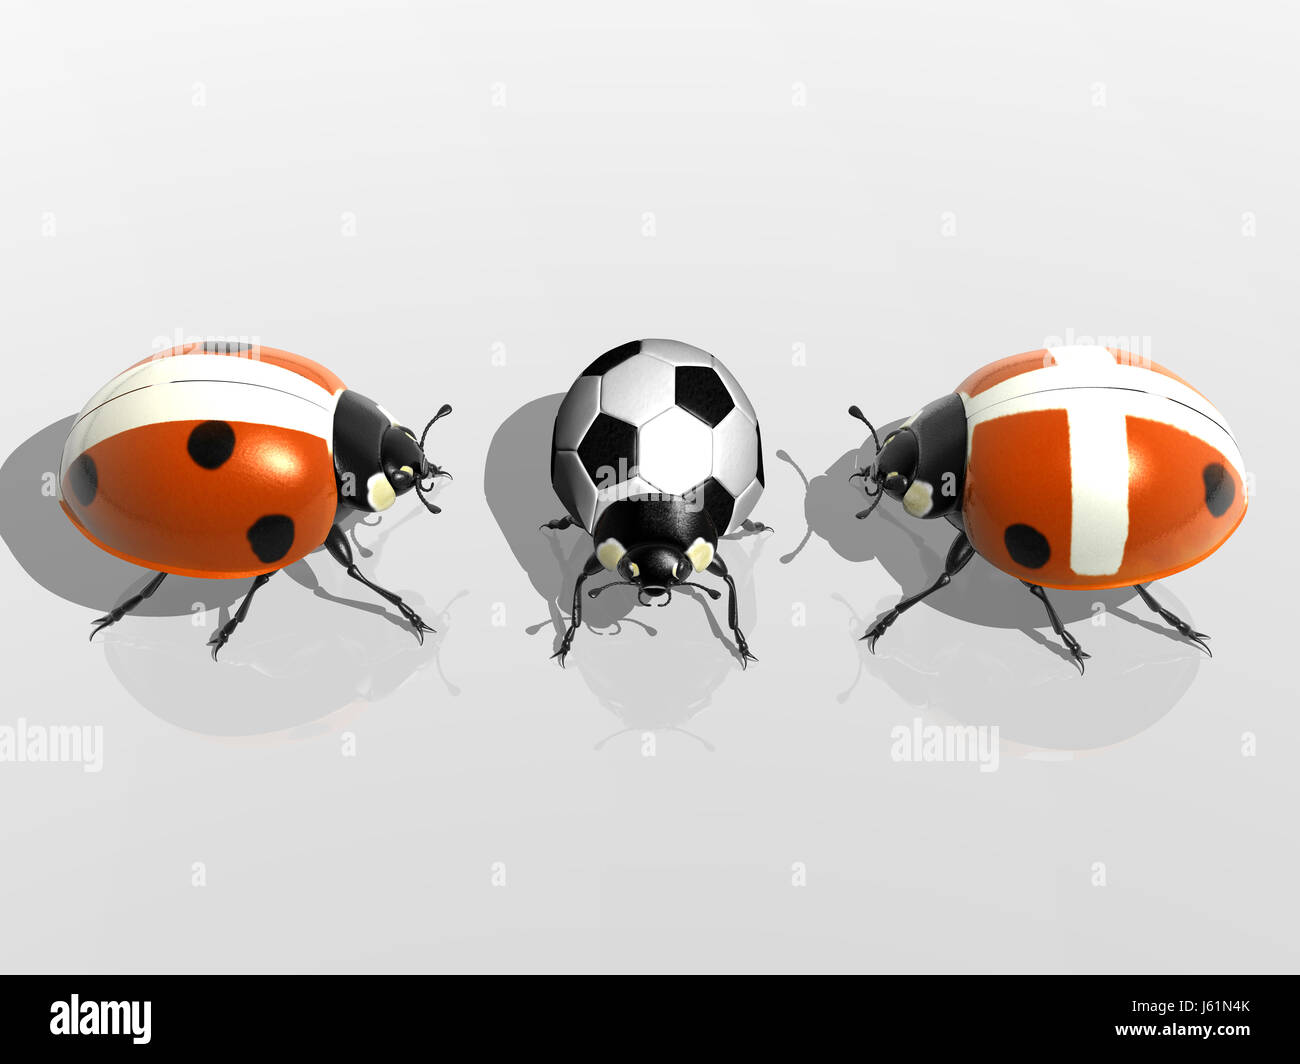 isolated beetle illustration gag ladybug isolated joke beetle illustration - Stock Image